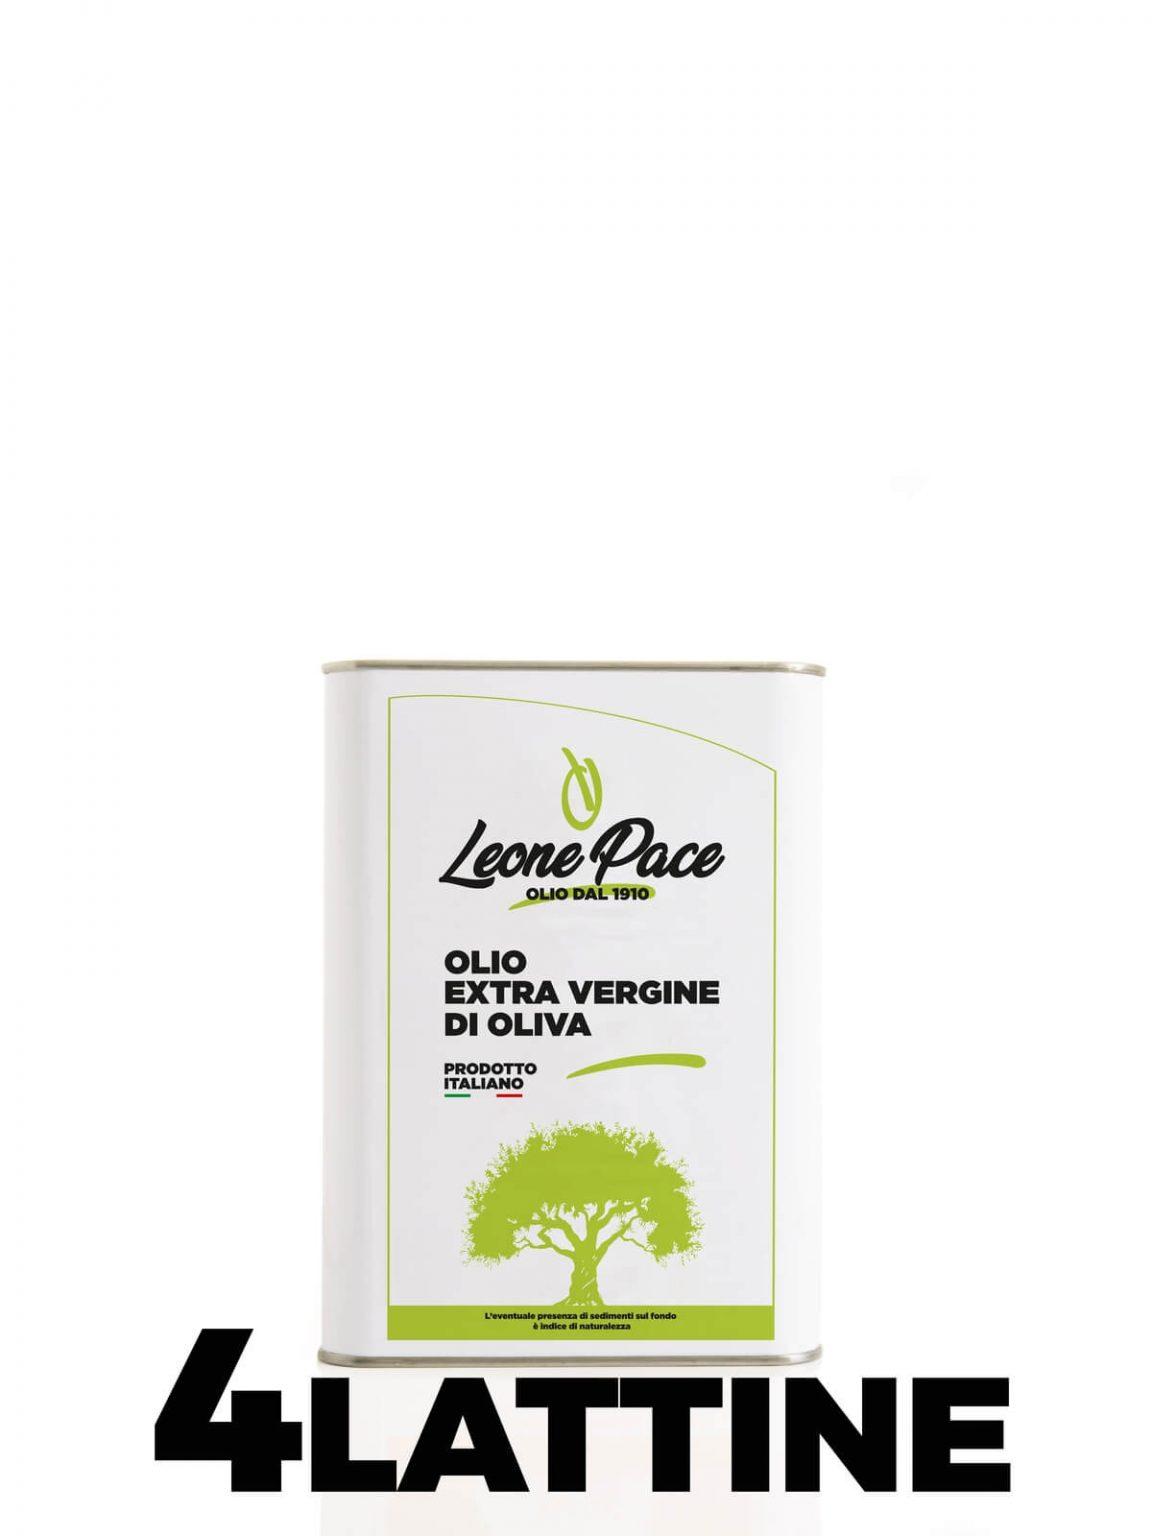 Olio EVO sapore leggero 3 lt Latta - Frantoio Leone Pace - Olio dal 1910 - Frantoio Pace